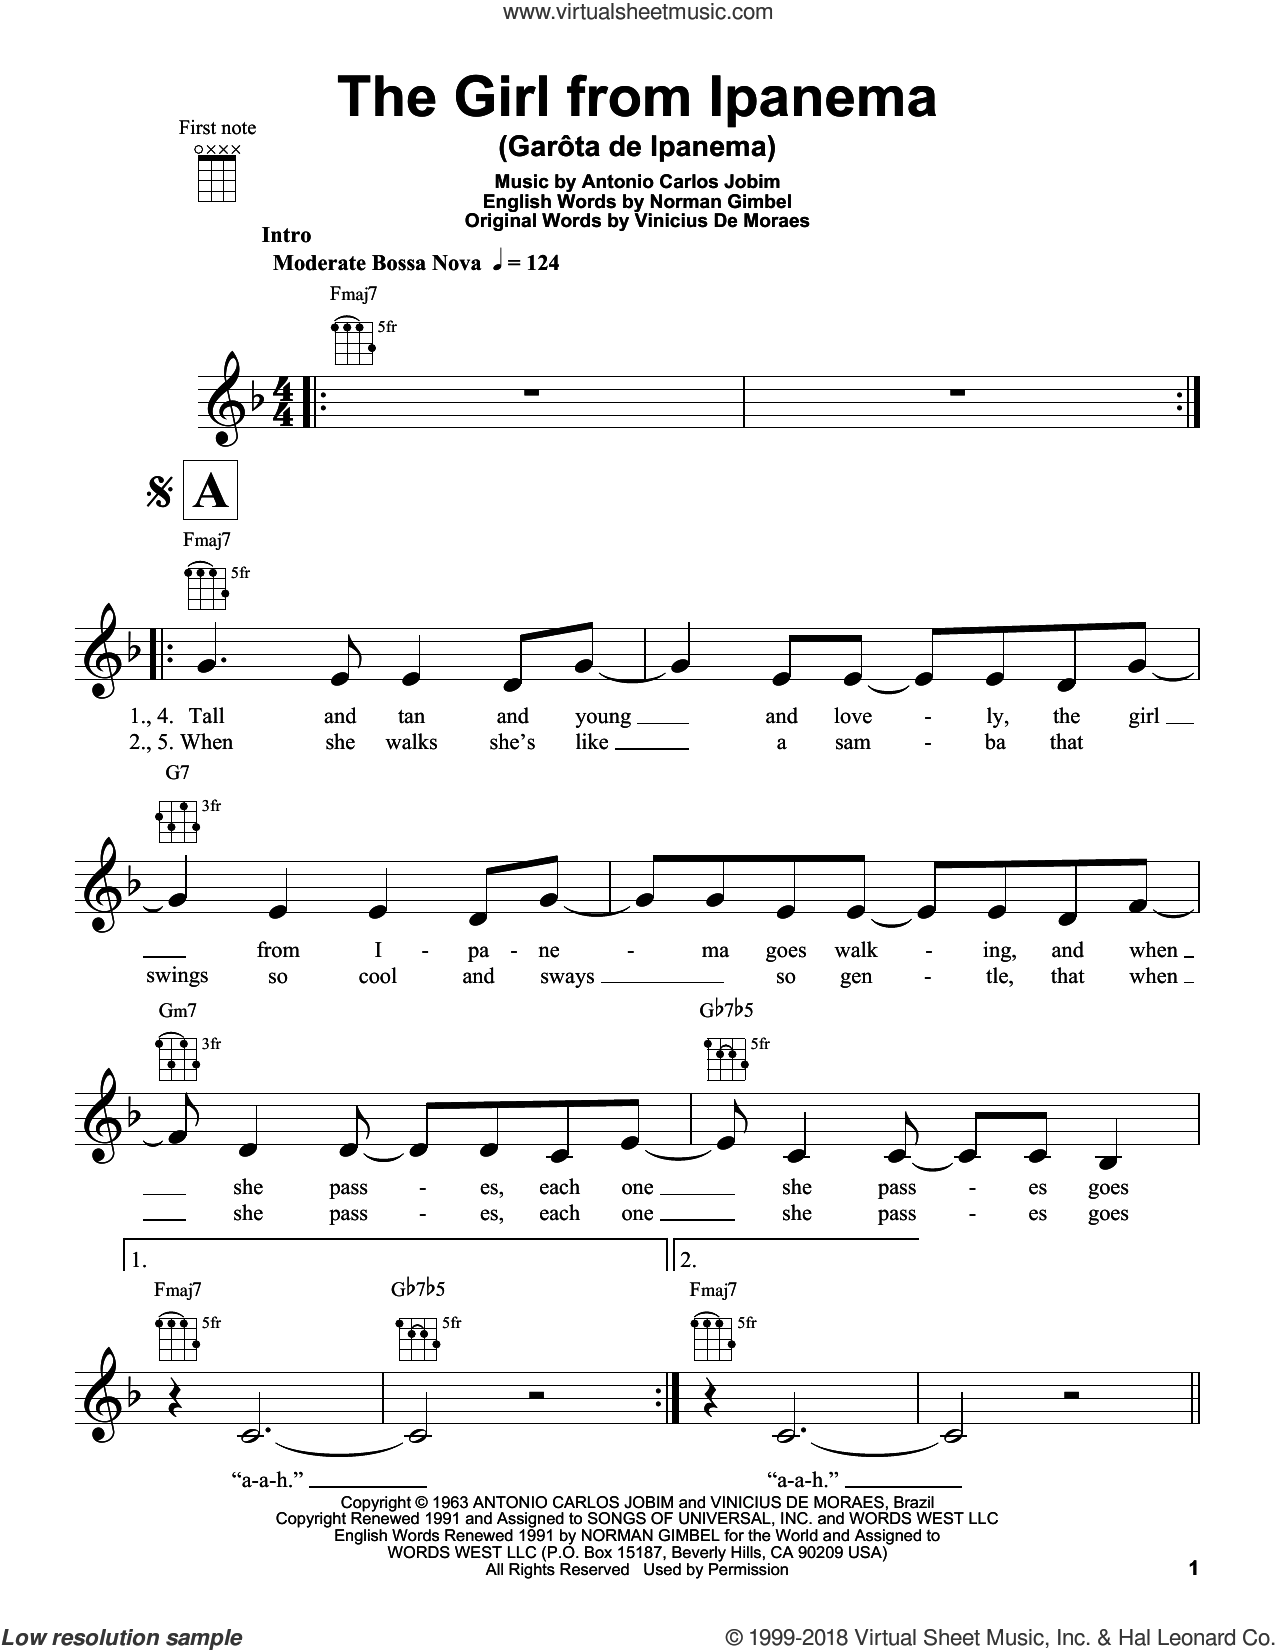 The Girl From Ipanema (Garota De Ipanema) sheet music for ukulele by Norman Gimbel, Antonio Carlos Jobim and Vinicius de Moraes, intermediate skill level